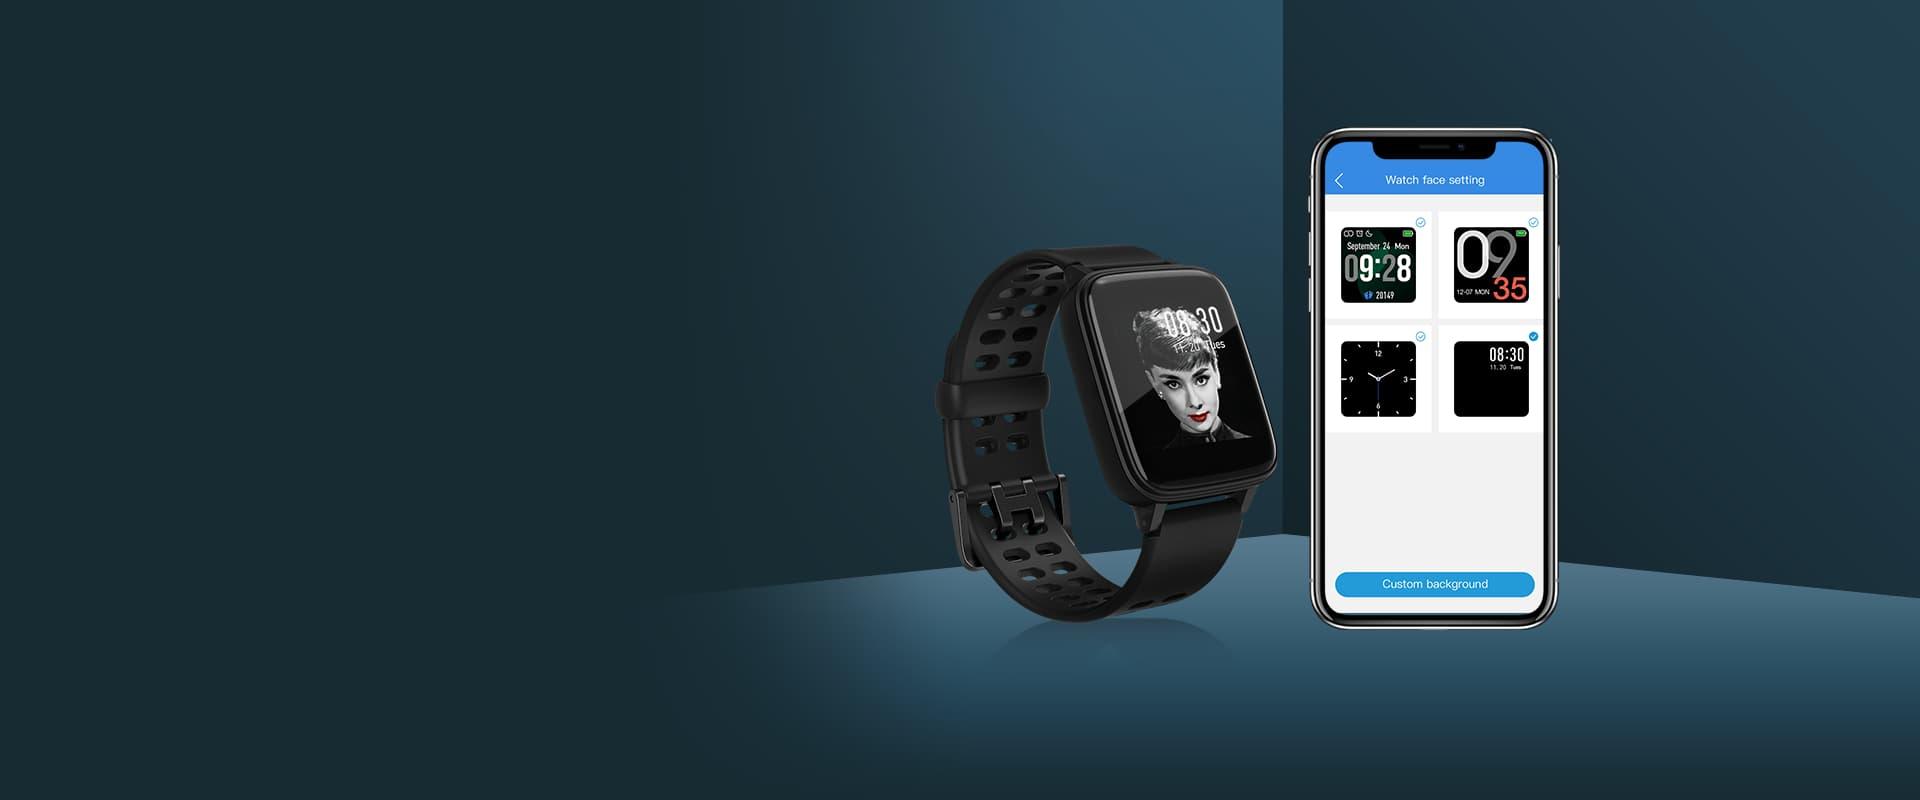 Smart Watch H709-P1